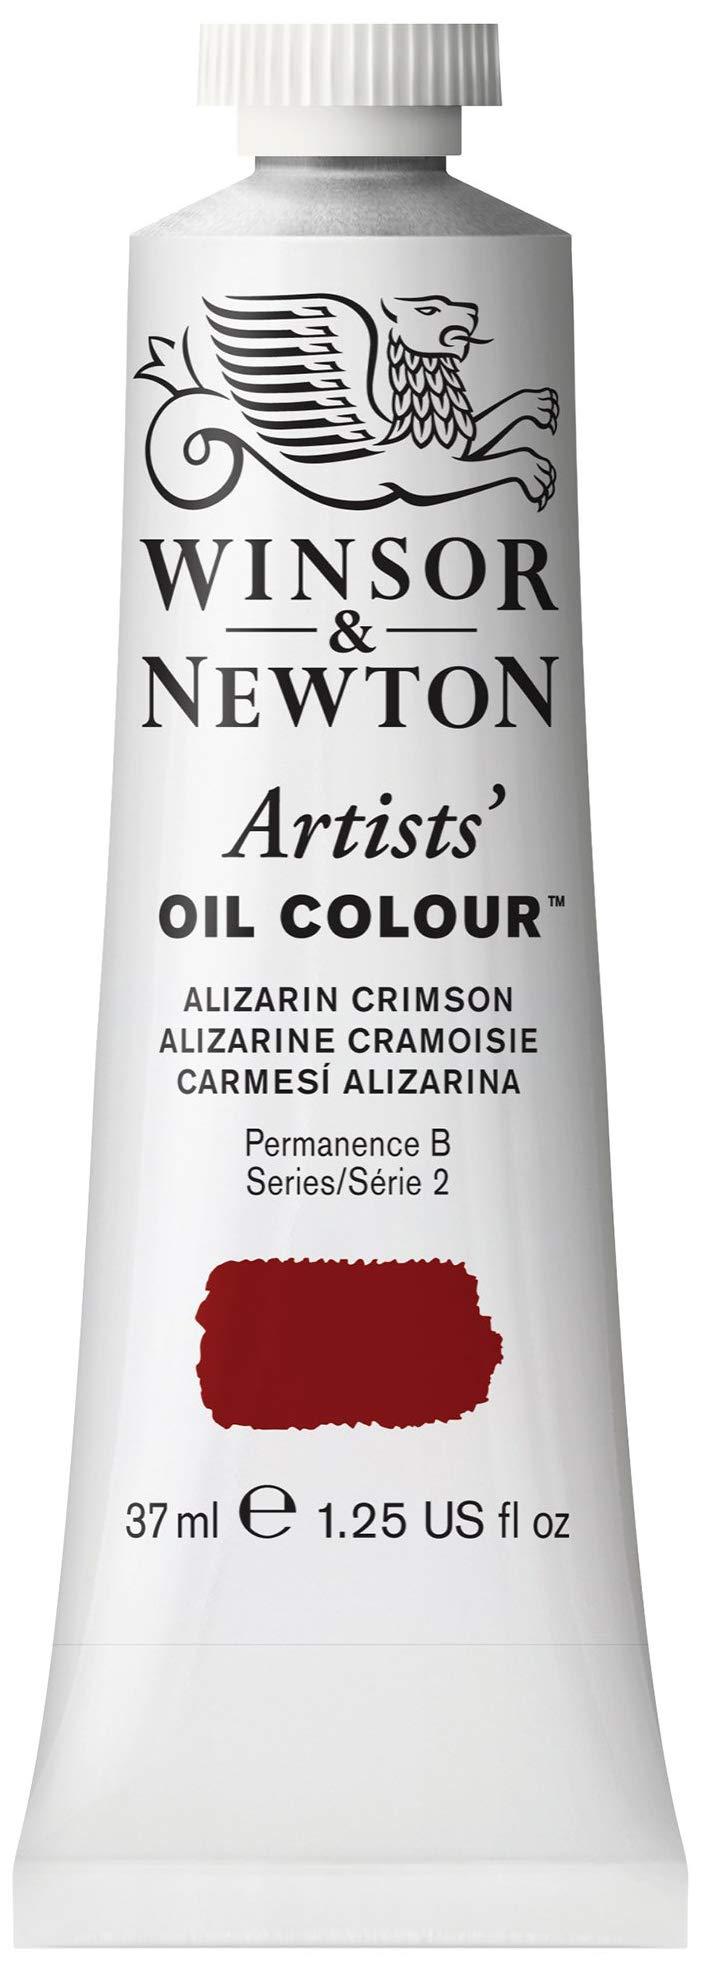 Winsor & Newton 1214004, Alizarin Crimson Artists' Oil Colour Paint, 37ml Tube, 37-ml